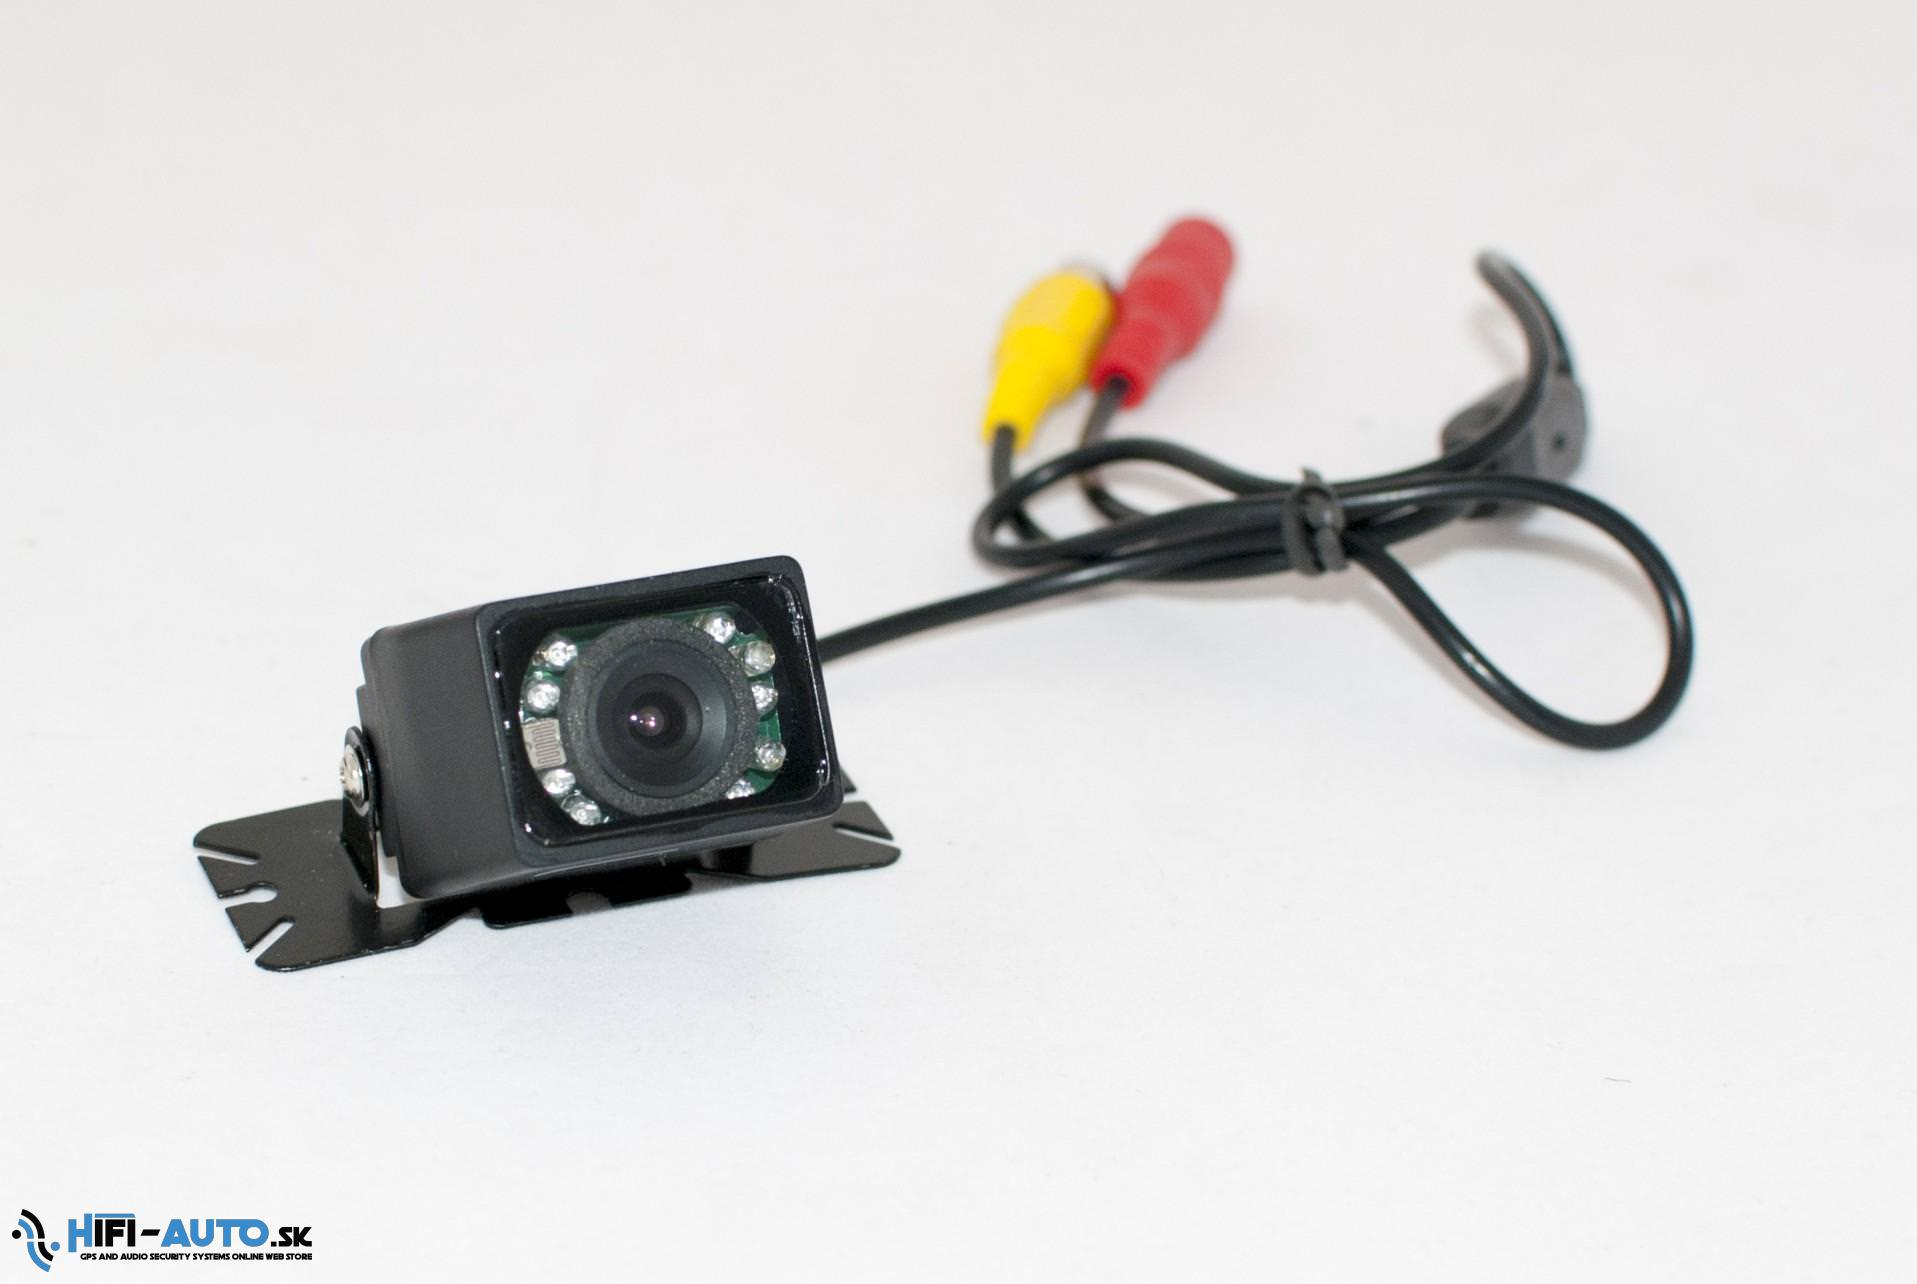 Cúvacia kamera TMX-04